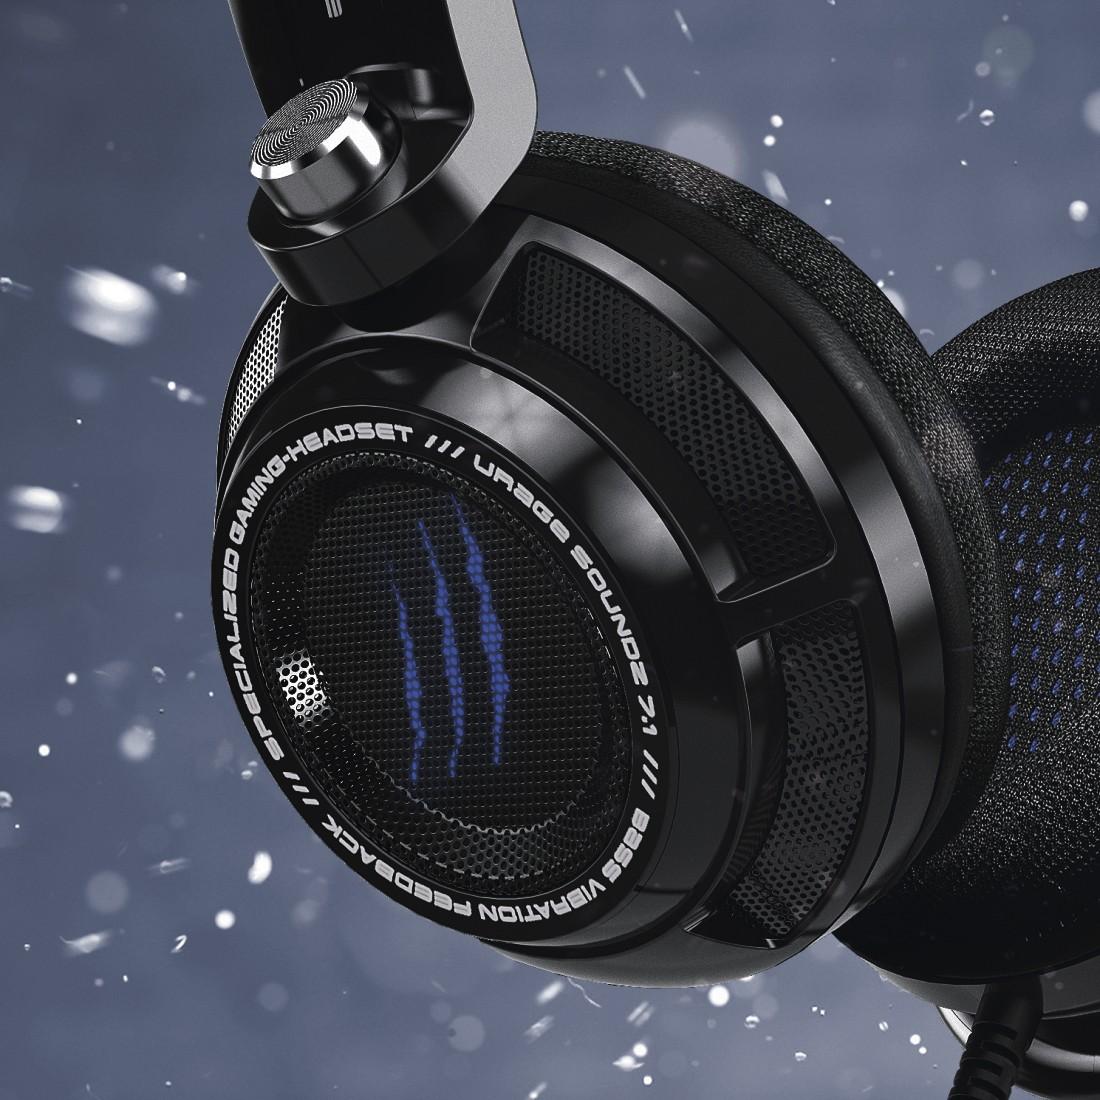 Hama uRAGE SoundZ 7 1 SoundZ Essential Gaming Headset Review Test Vergleich SoundZ 7 1 Seite